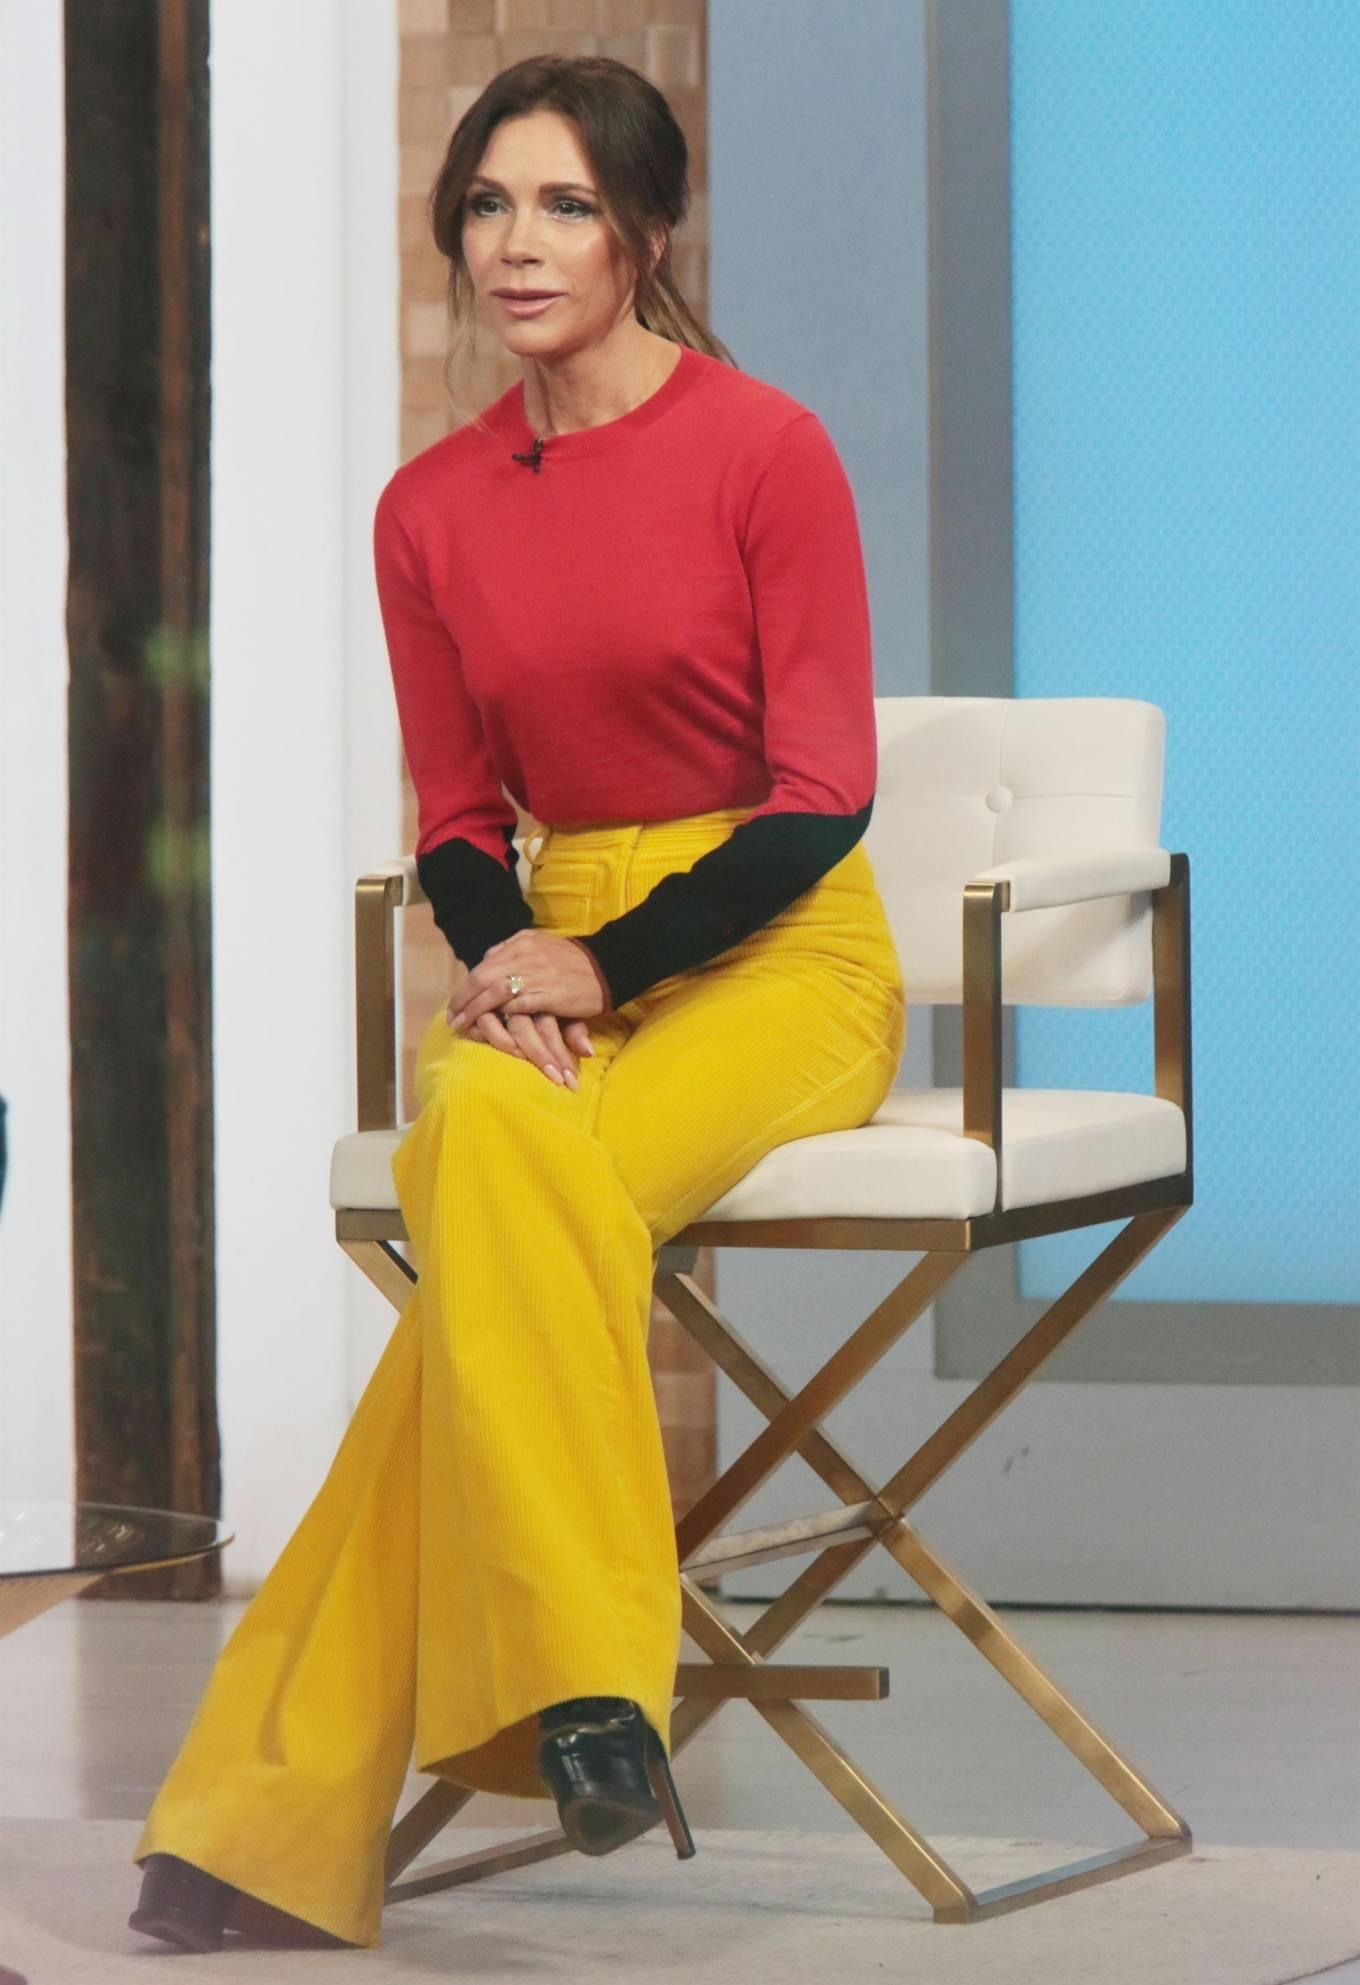 Victoria Beckham 2021 : Victoria Beckham – on Good Morning America promoting her new designer clothing in New York City-18